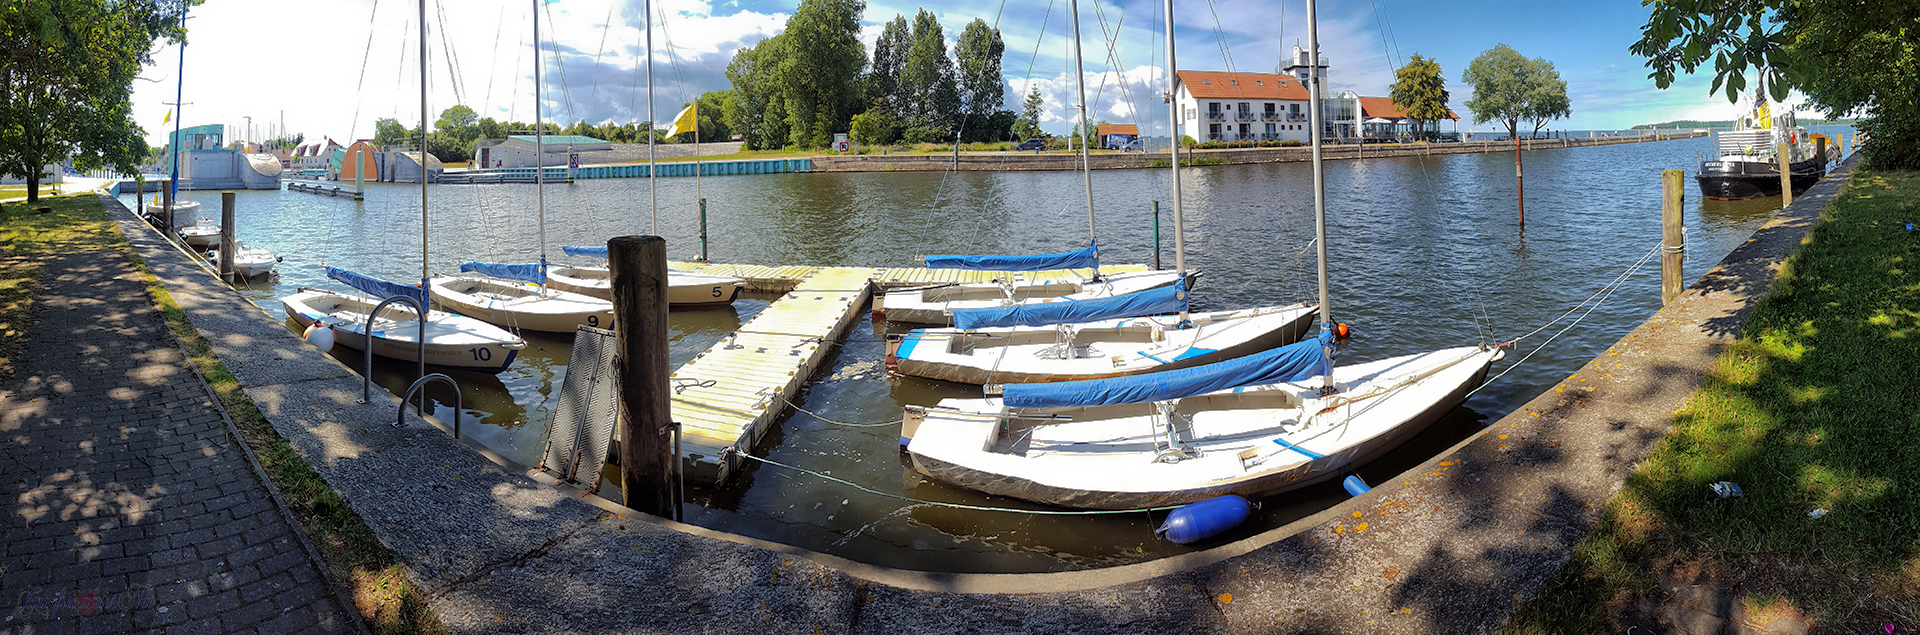 Sommernachmittag in Greifswald-Wieck